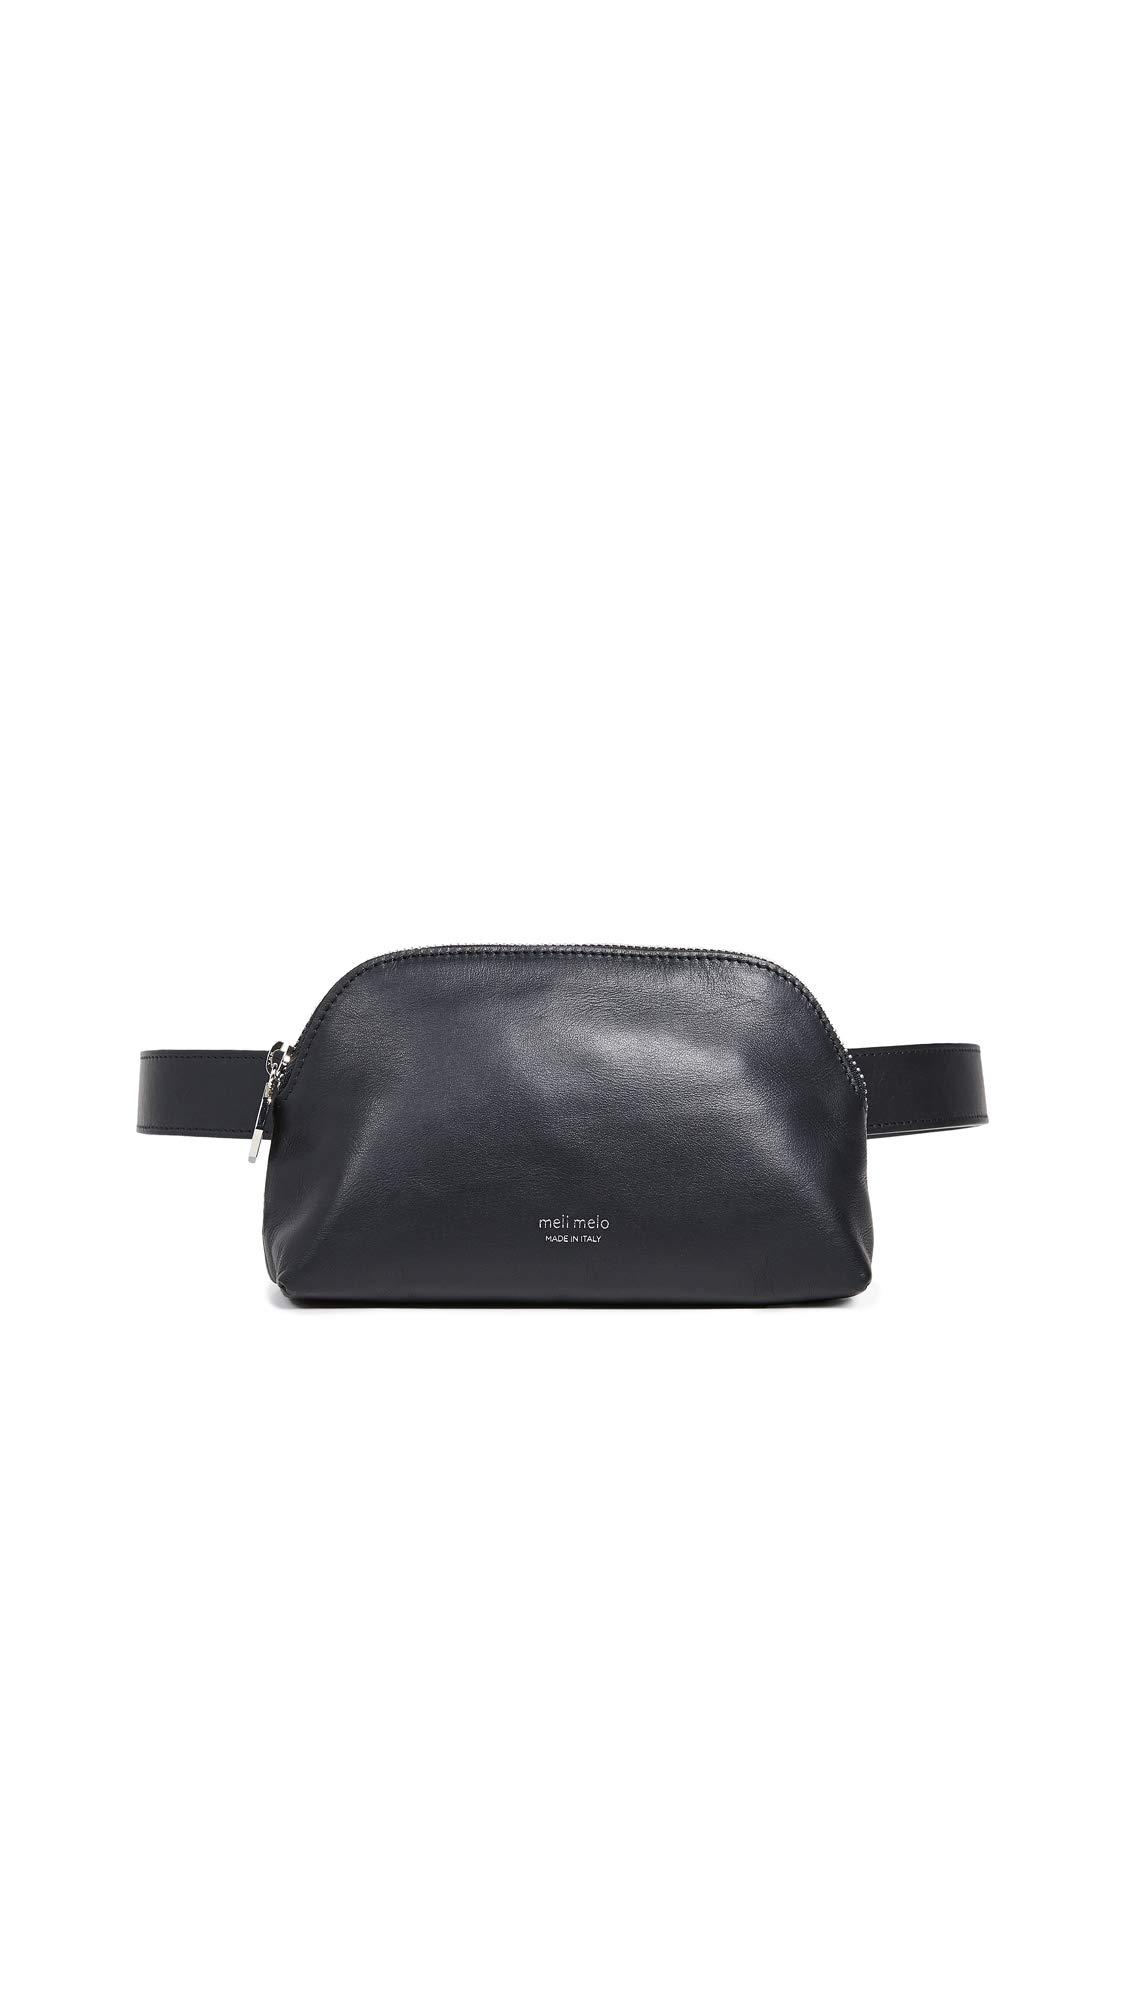 meli melo Women's Bum Bag, Black, One Size